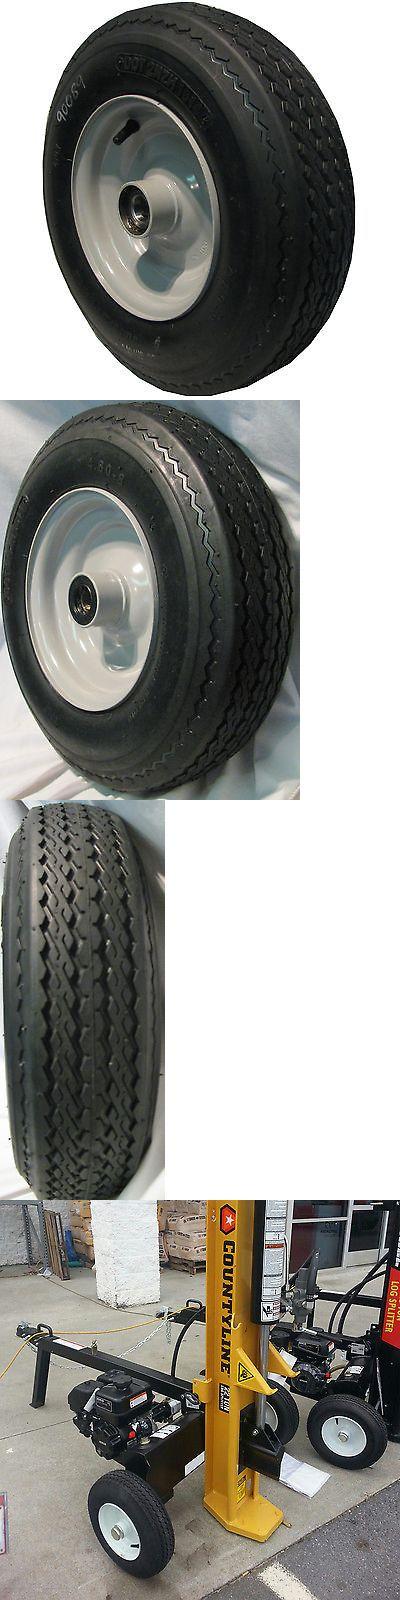 Log Splitters 39019: 1) 4.80-8 4.80X8 480X8 480-8 Oe Log Splitter Tire Rim Wheel Some Huskee Airens -> BUY IT NOW ONLY: $78.95 on eBay!